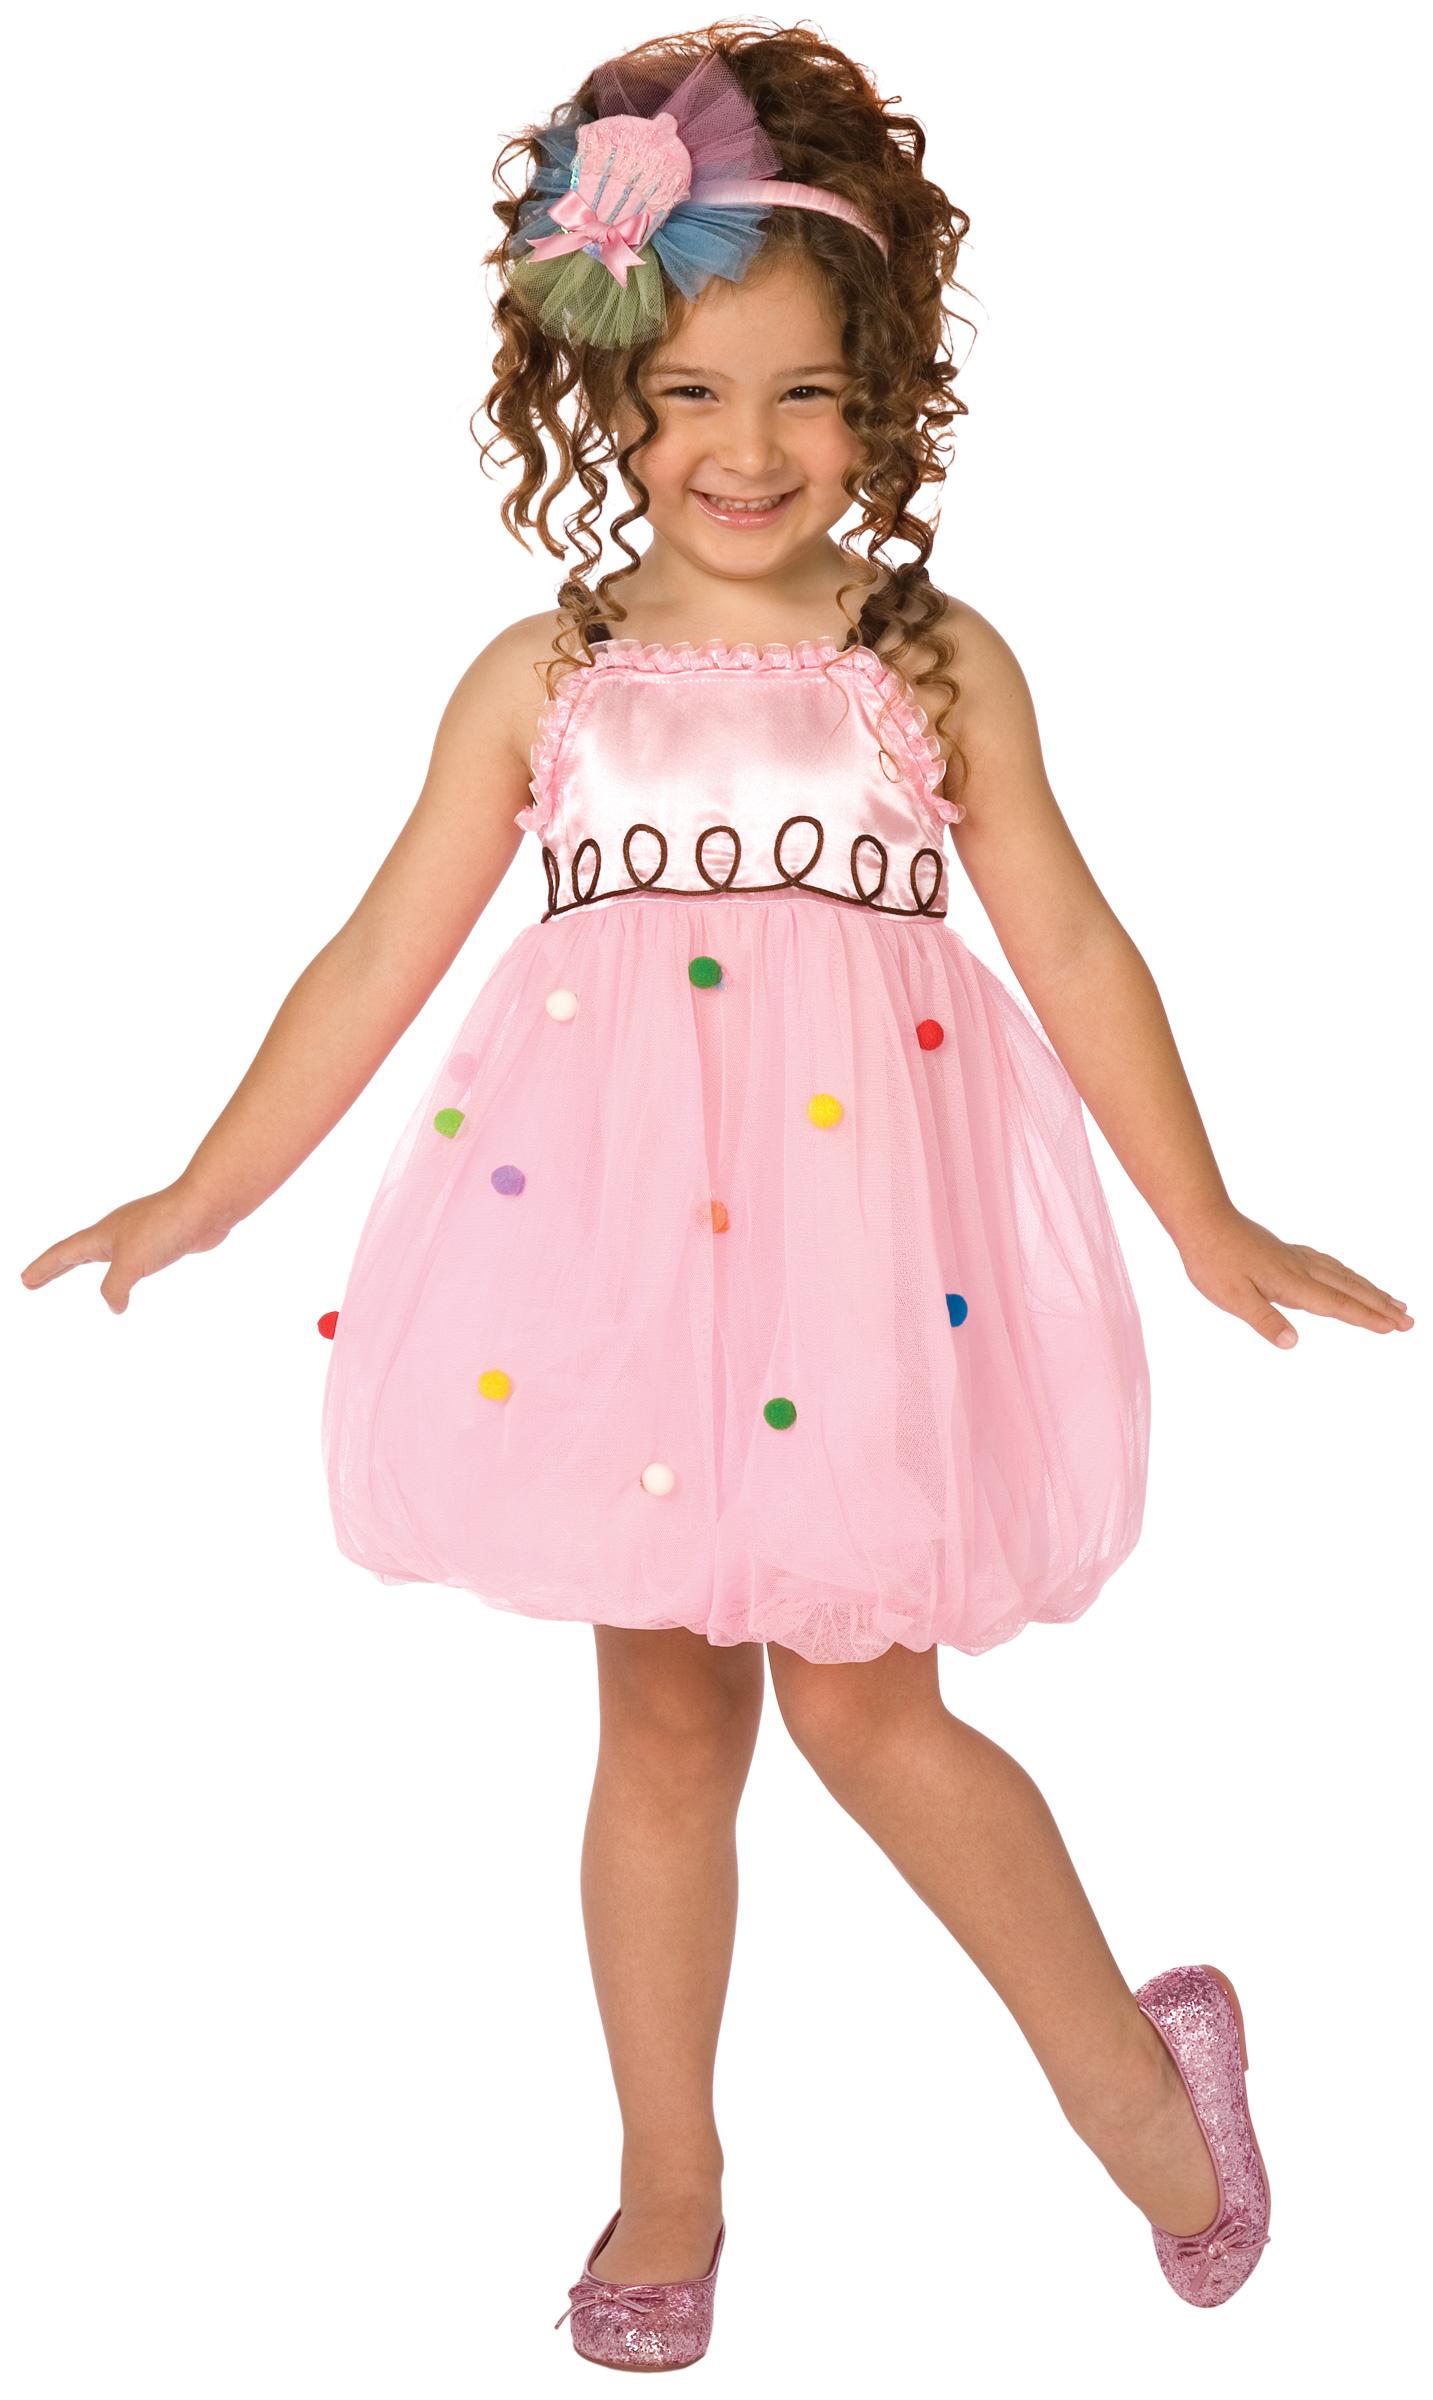 4162ab48d356 Costume cupcake bambina: Costumi bambini,e vestiti di carnevale online -  Vegaoo